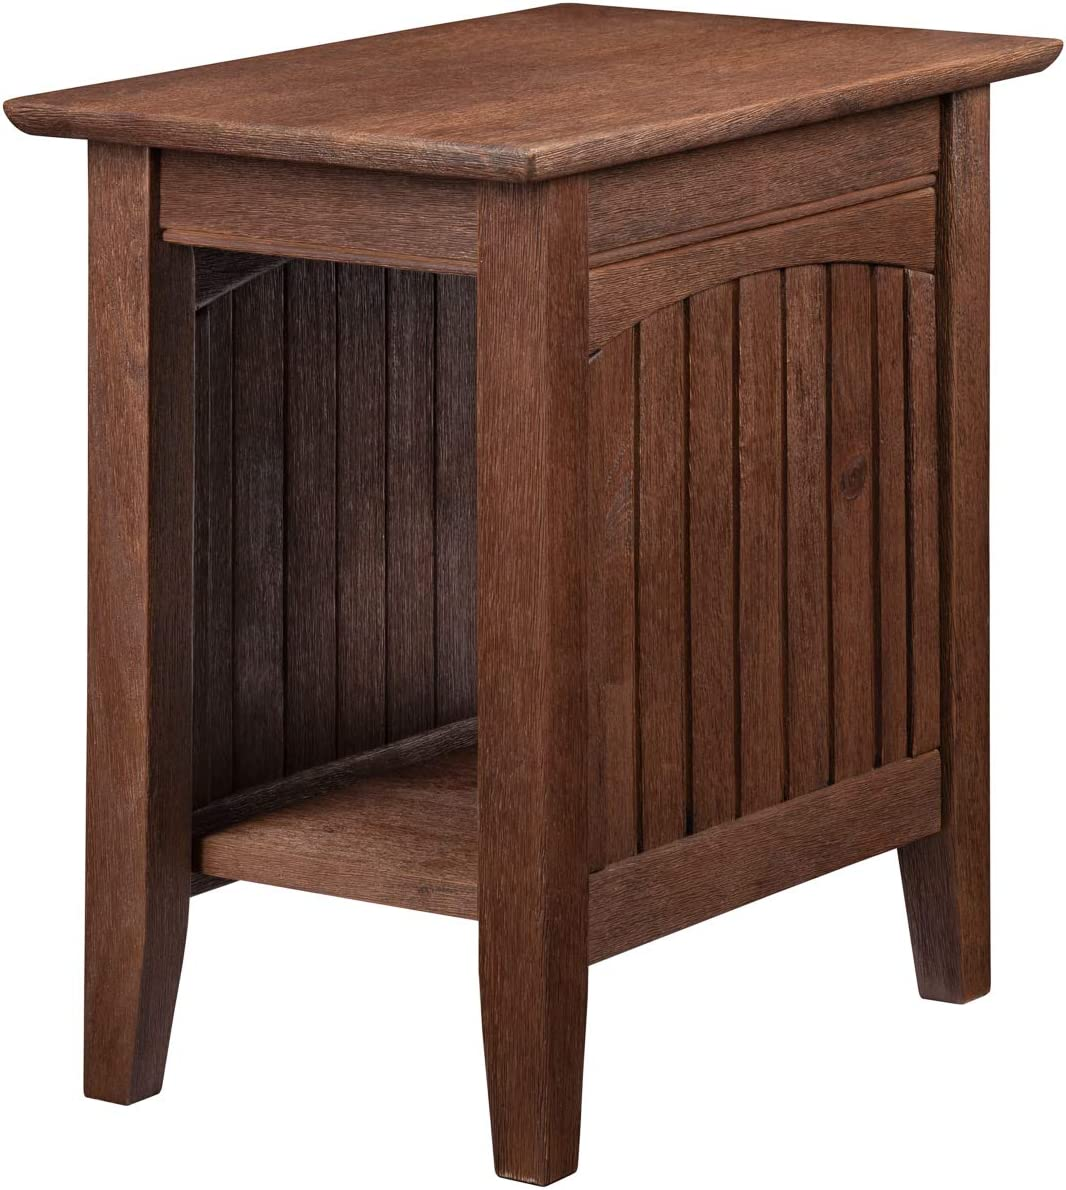 Atlantic Furniture Nantucket Chair Side Table, Coffee (22